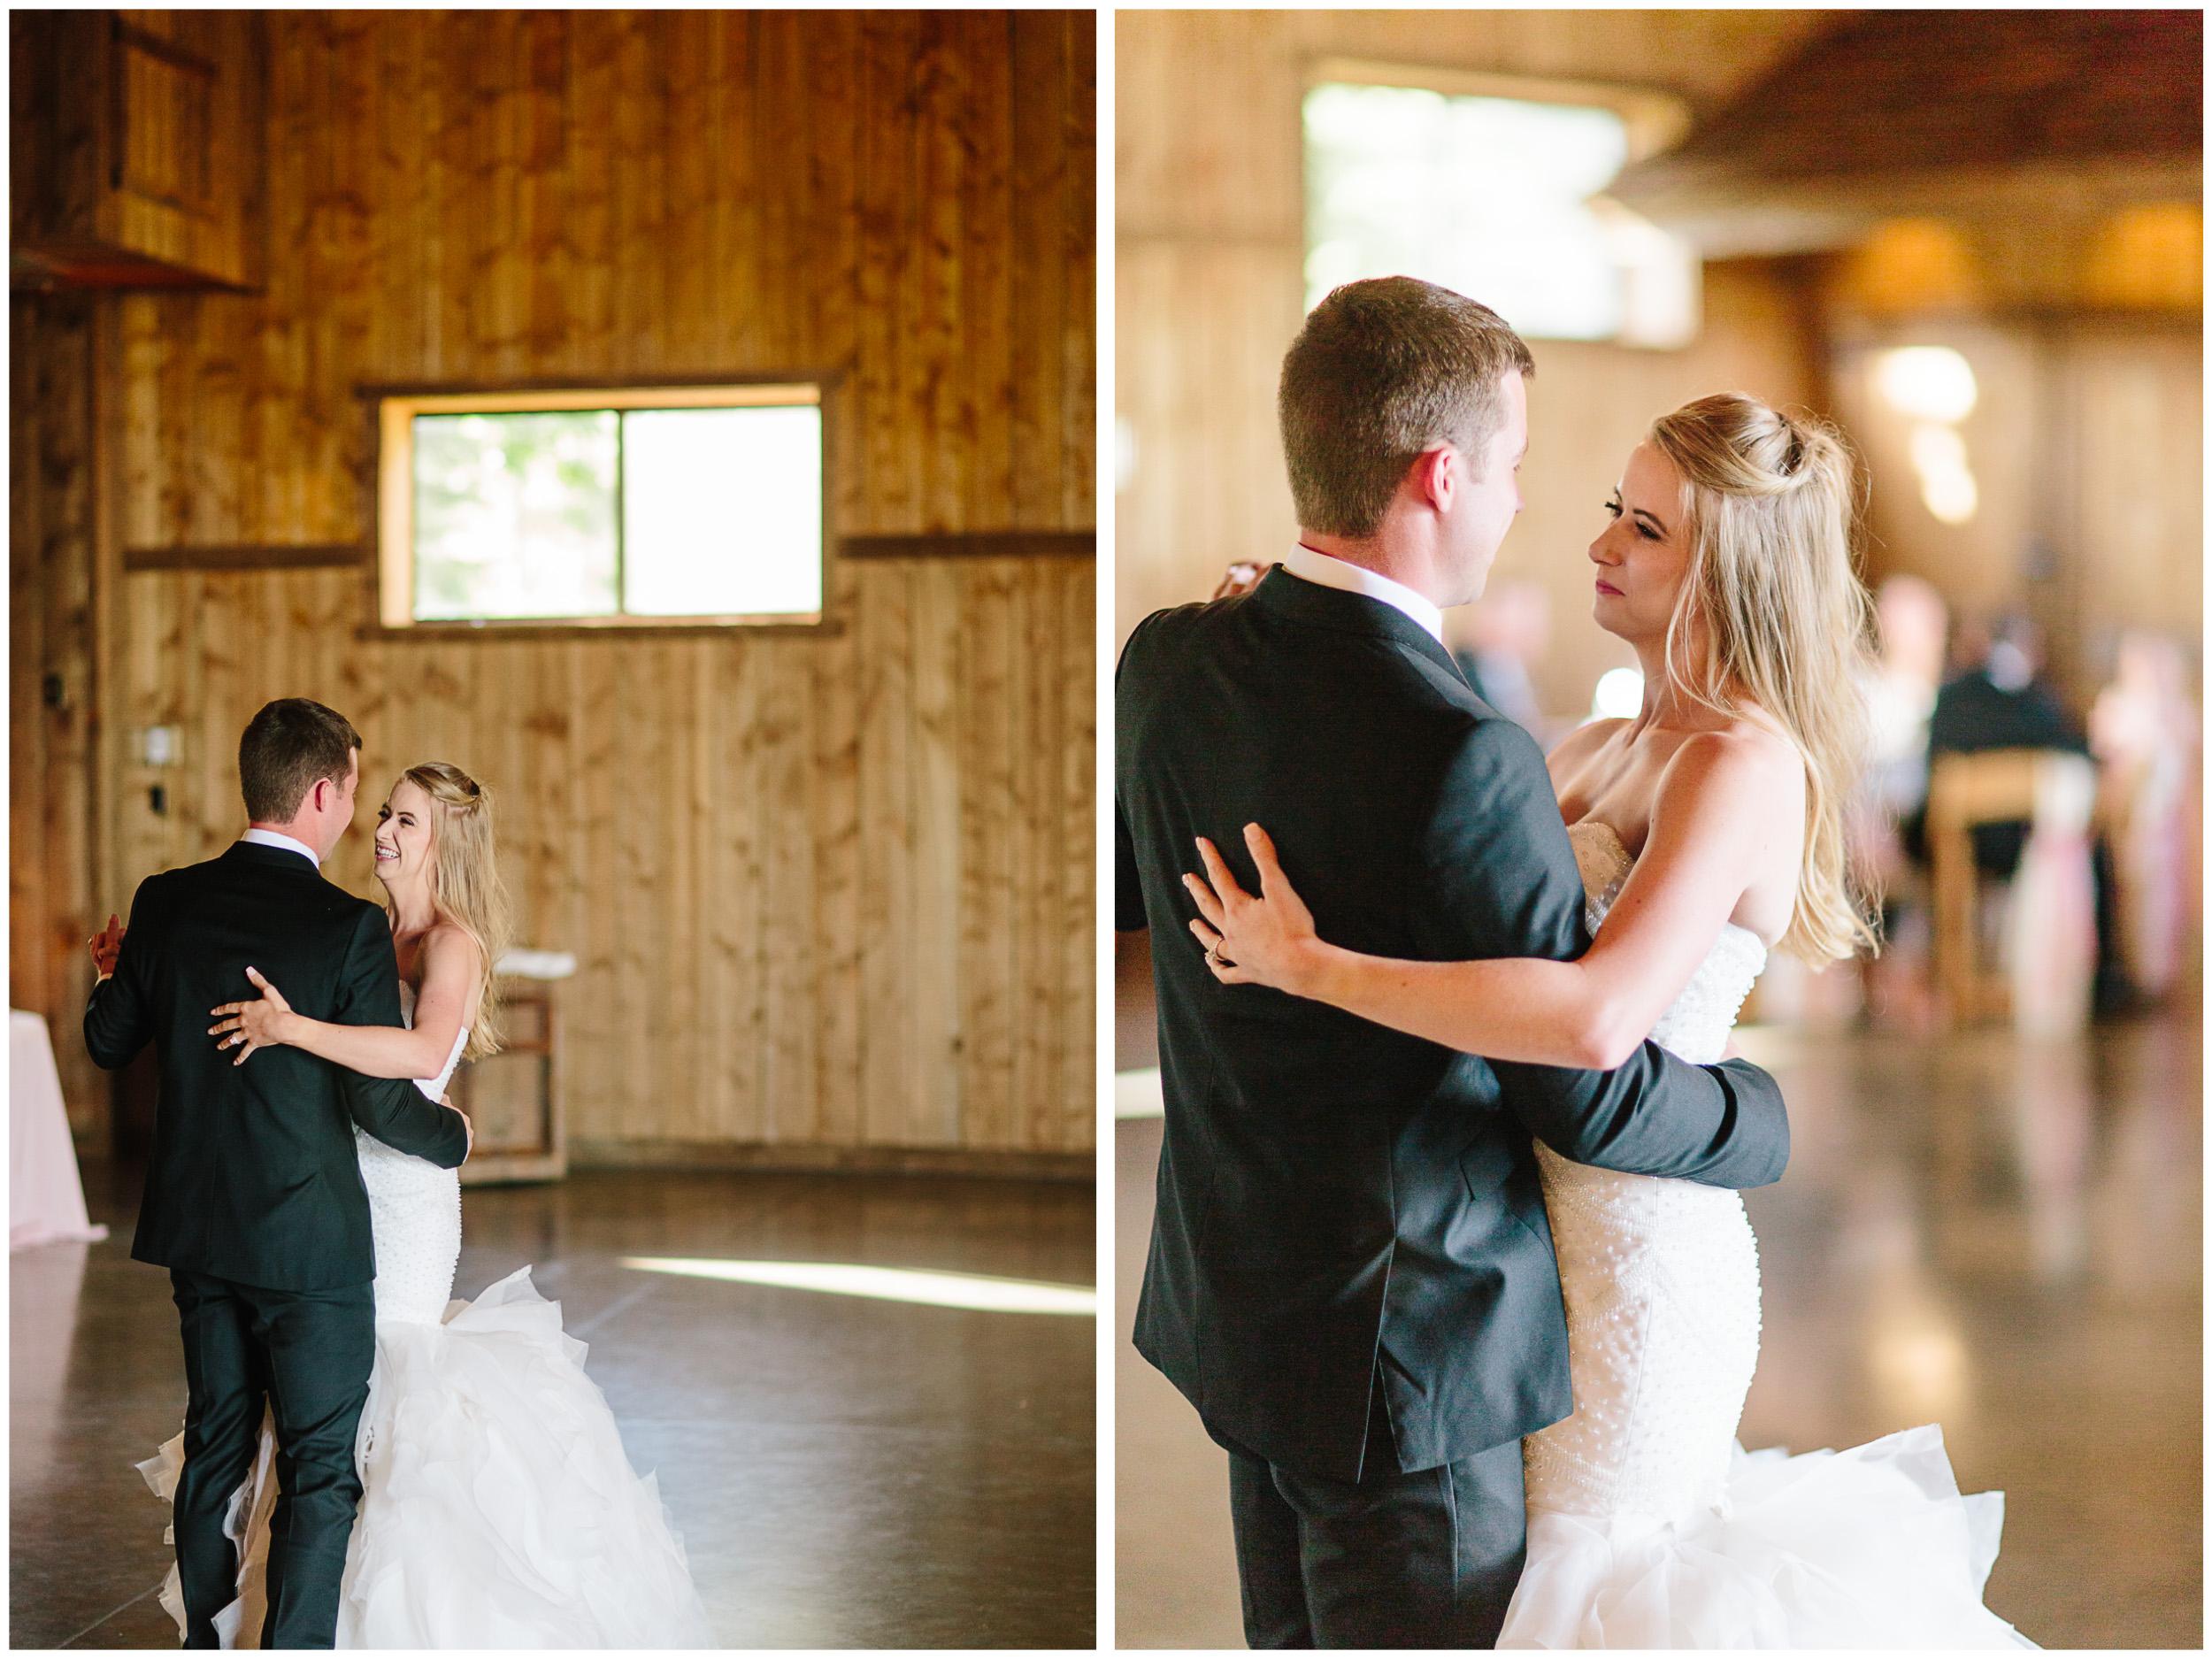 spruce_mountain_ranch_wedding_56.jpg